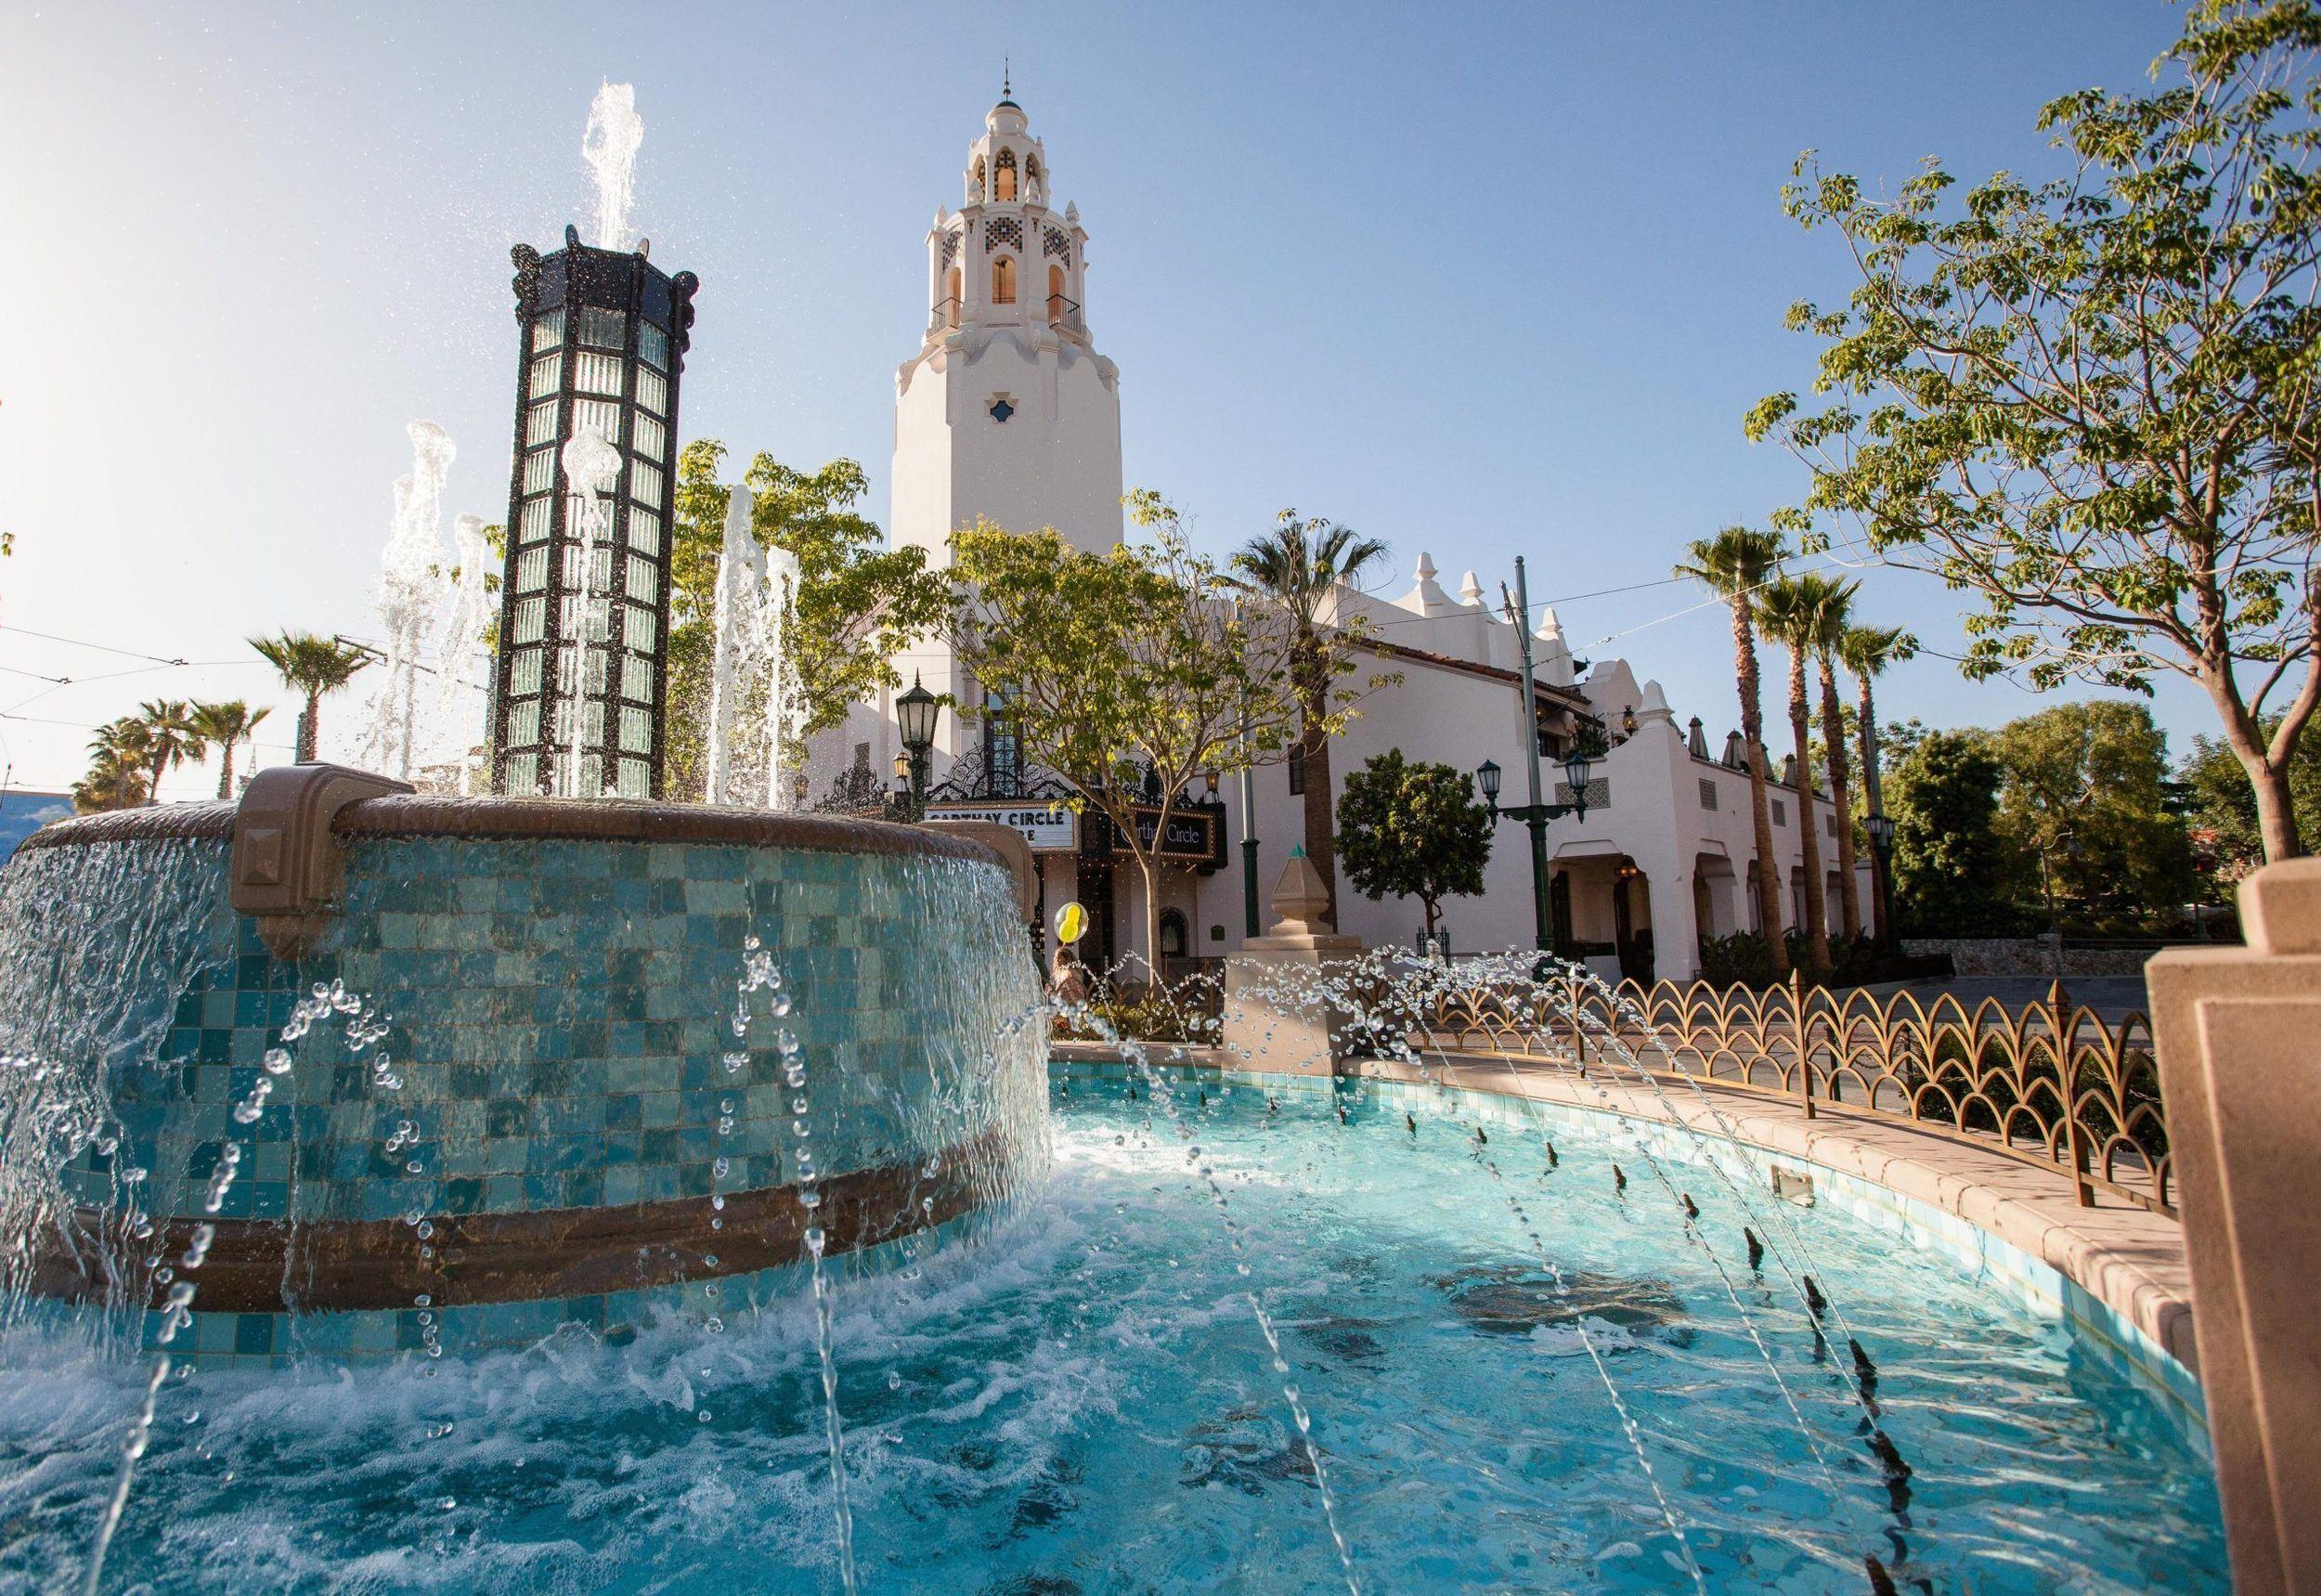 Carthay Circel Restaurant at Disney California Adventure Park